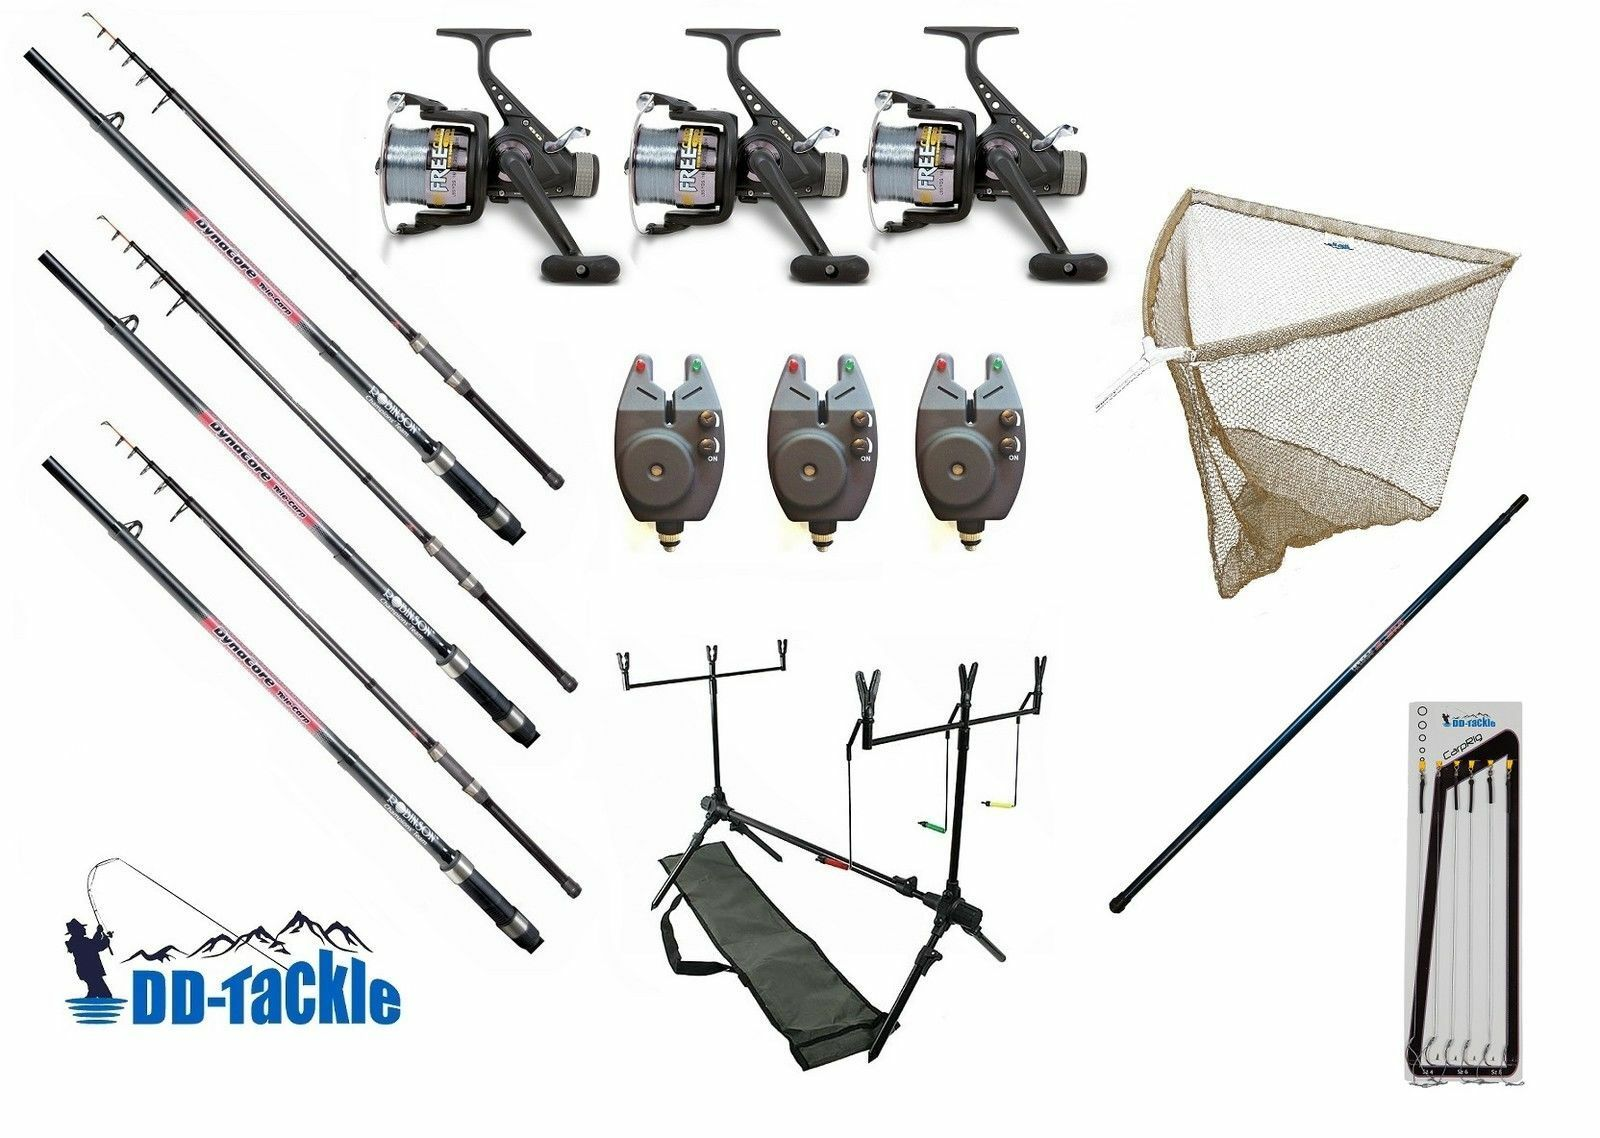 Set Pesca autopa Canne 3,60m 2,75lbs Bobina Indicatore Morso Asta Pod Retino